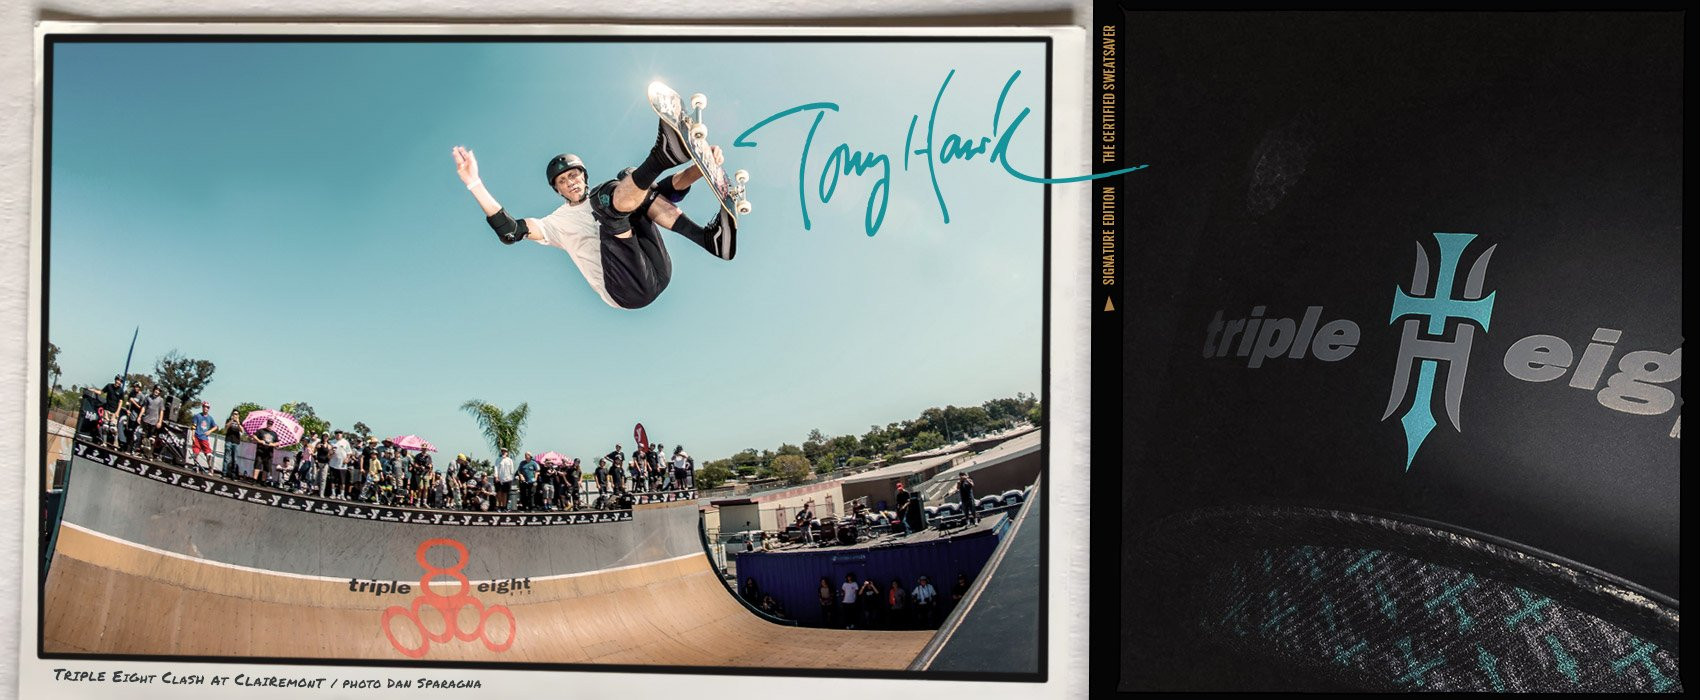 Certified Sweatsaver Tony Hawk Edition